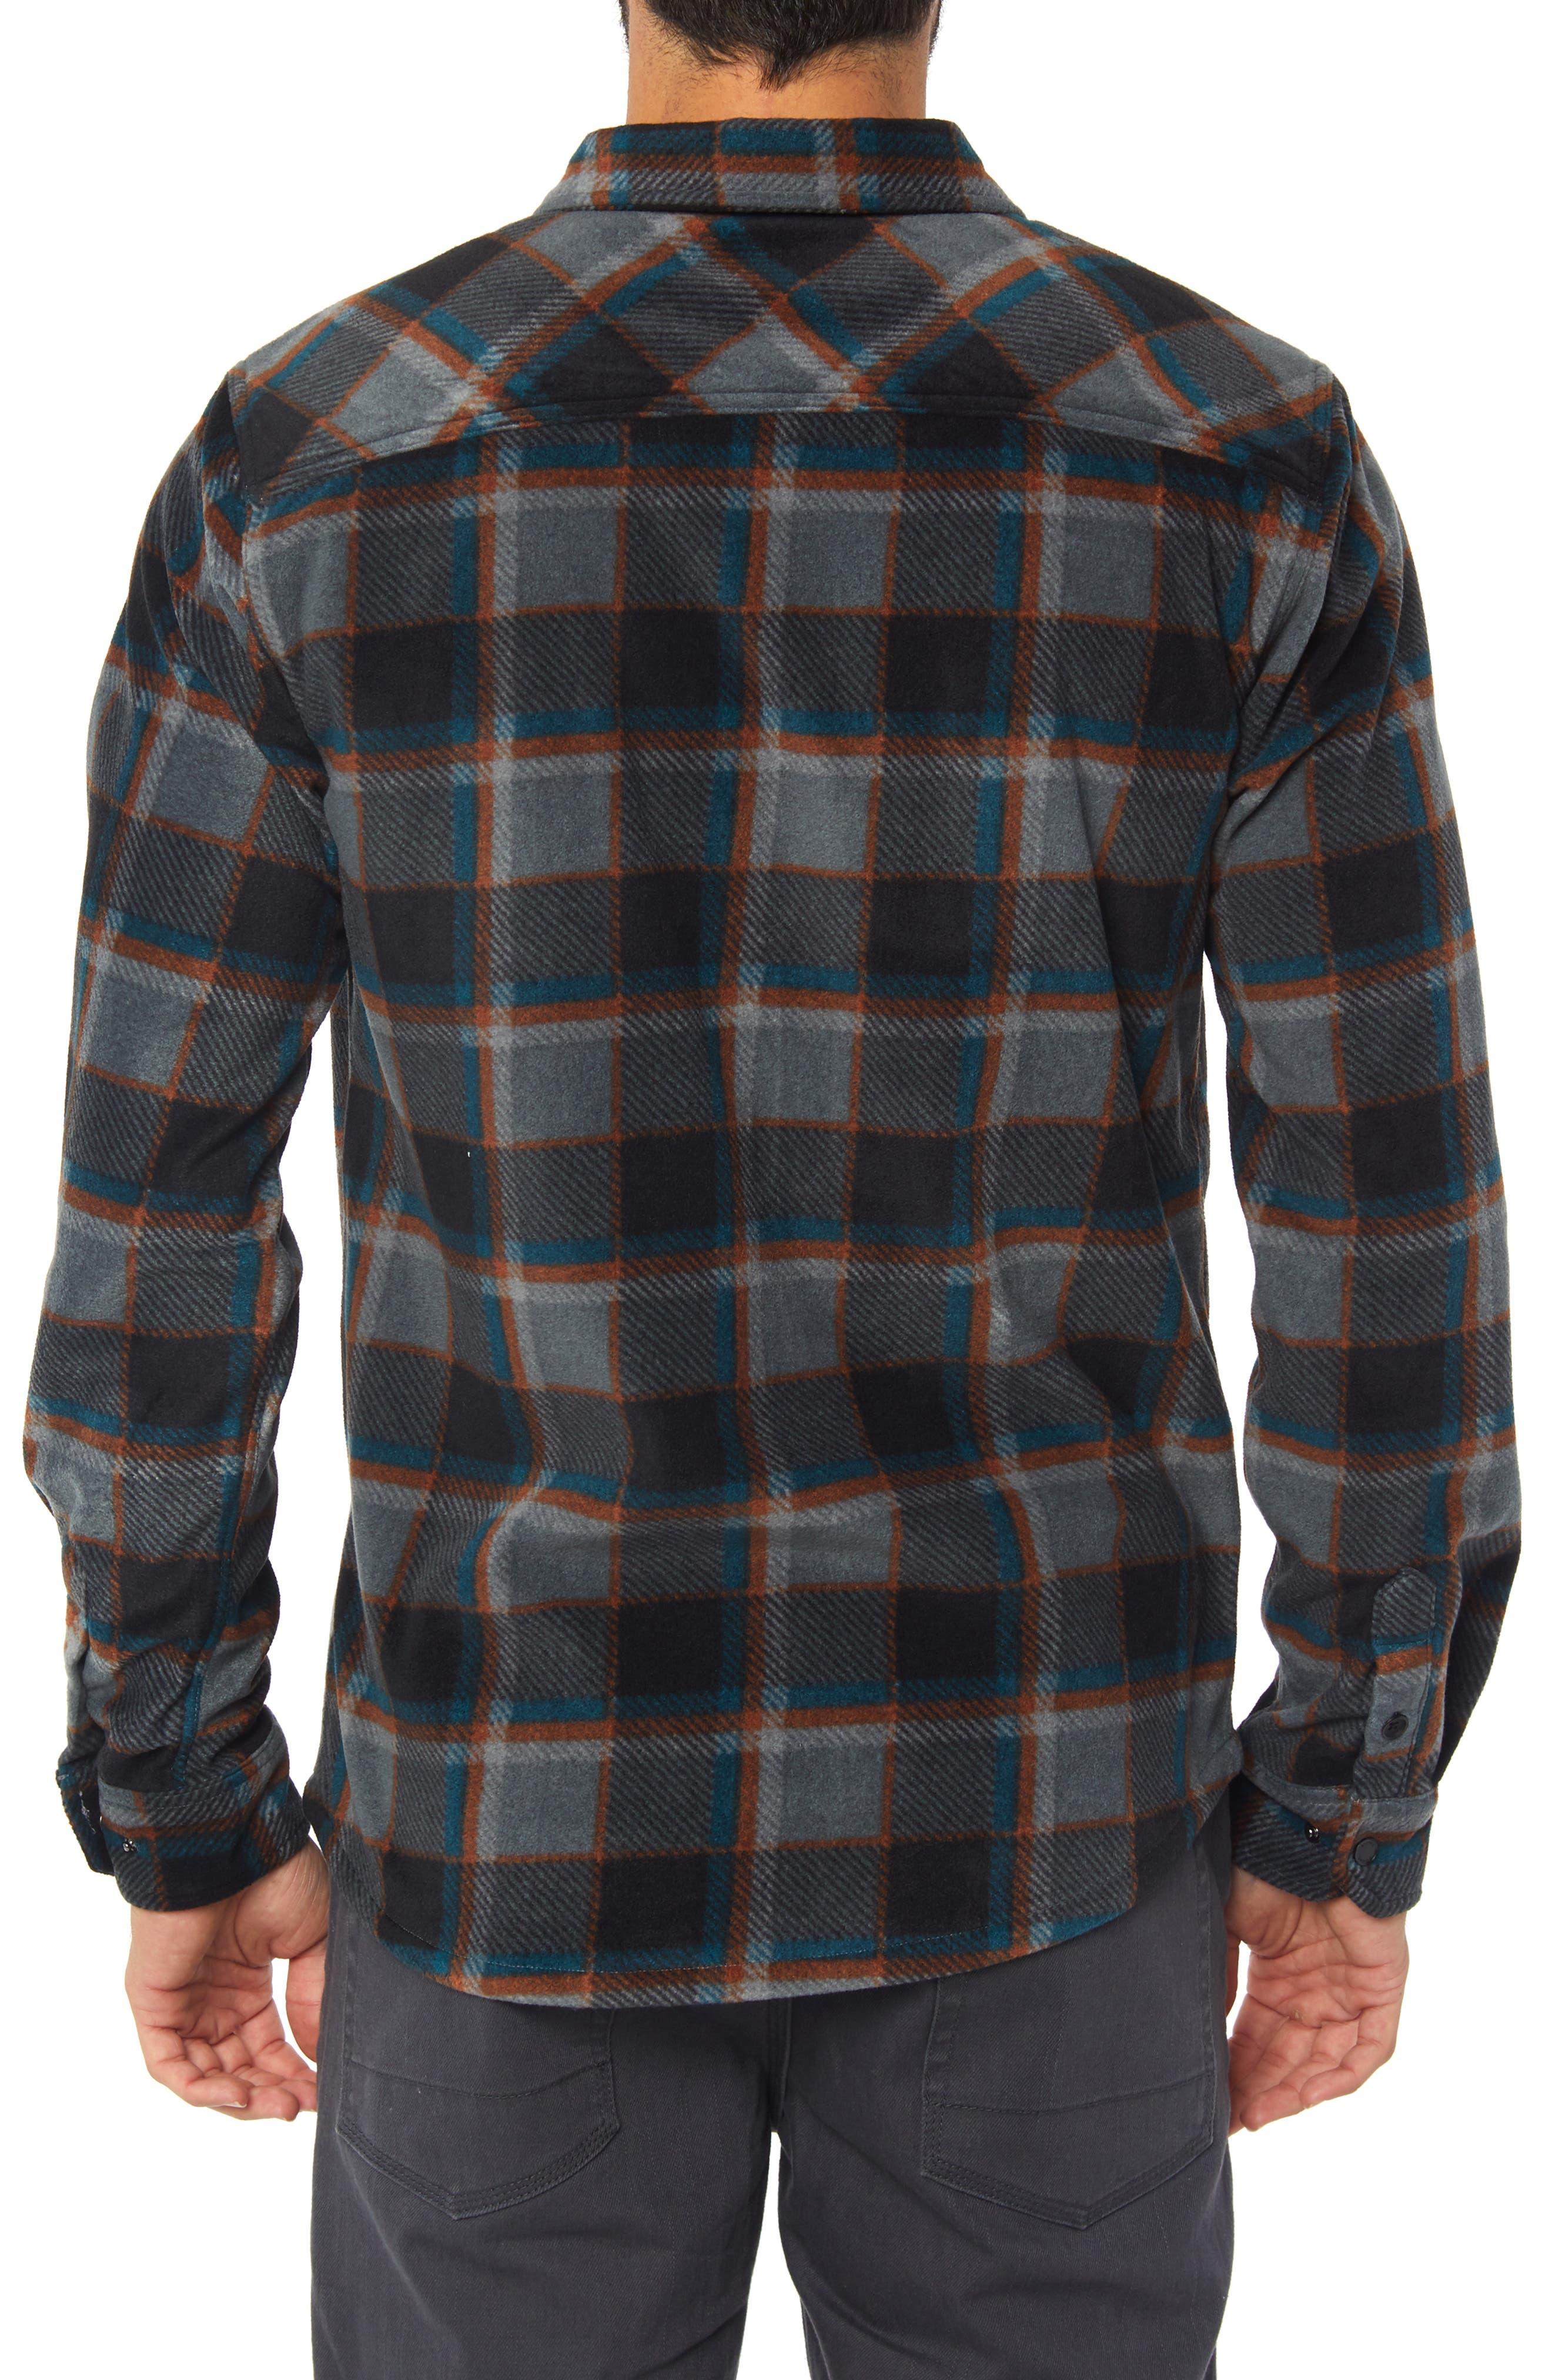 Glacier Crest Shirt,                             Alternate thumbnail 2, color,                             ASPHALT